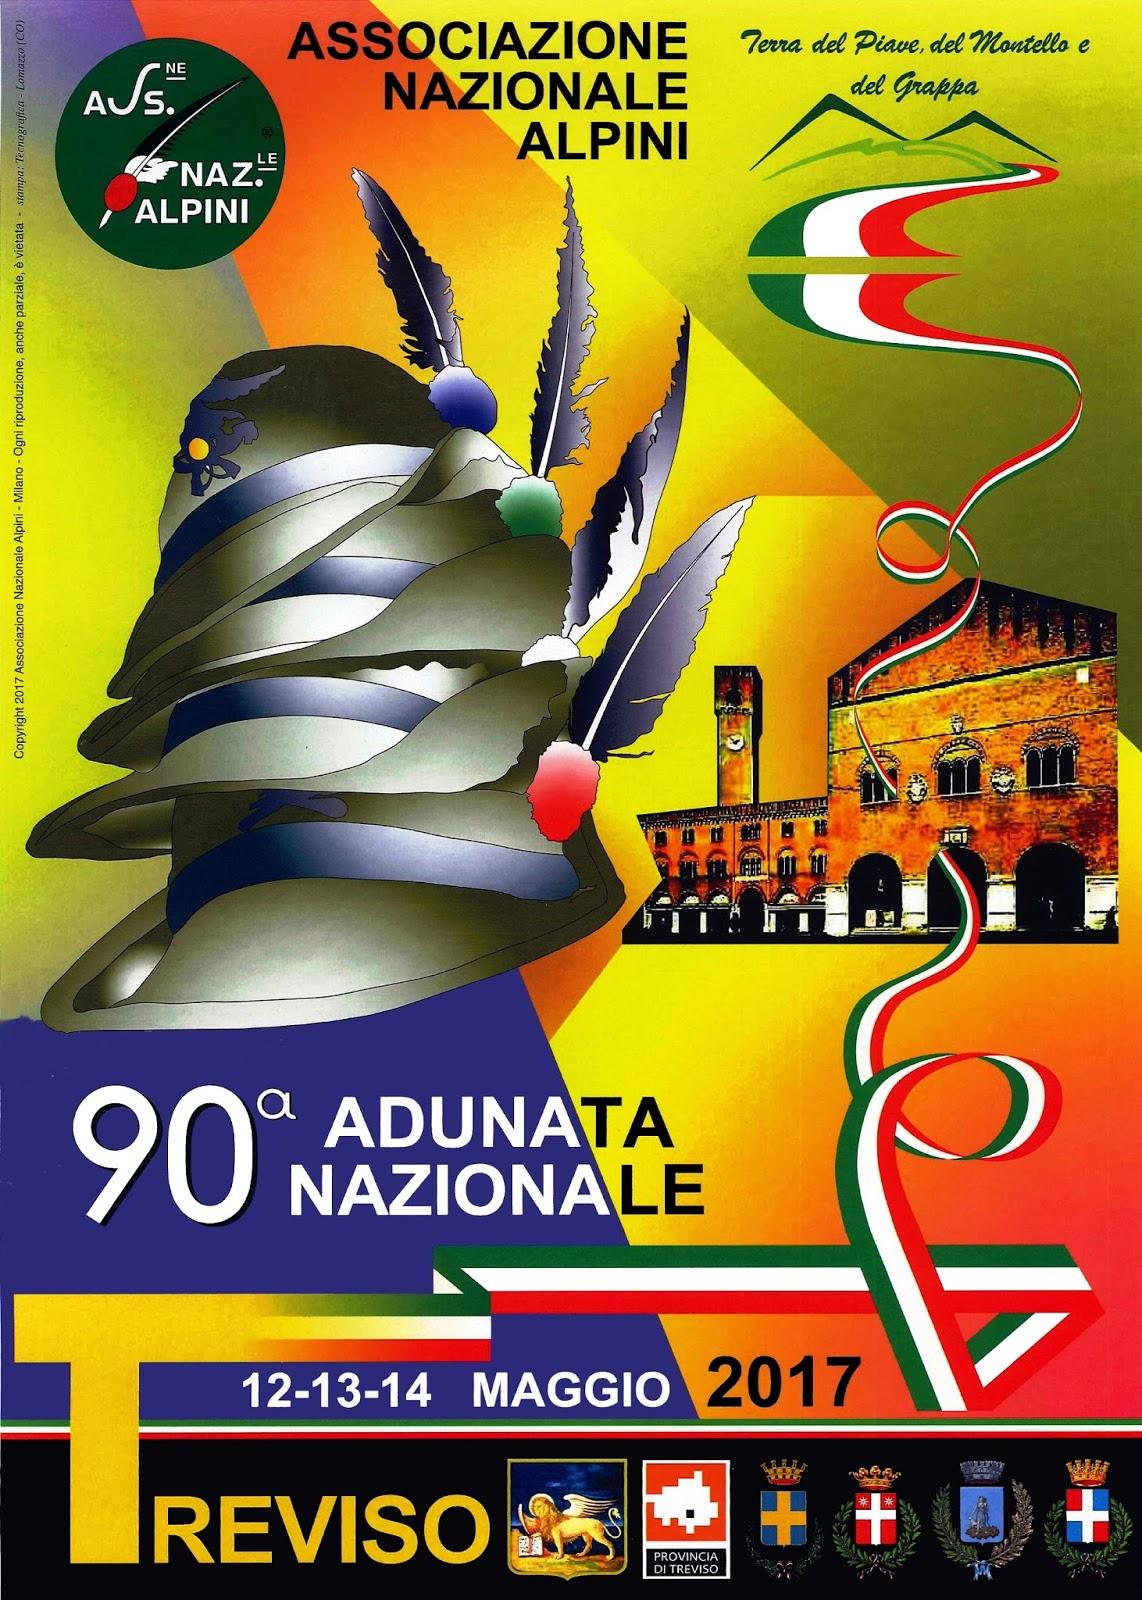 manifesto-adunata-alpini_2017_1.jpg